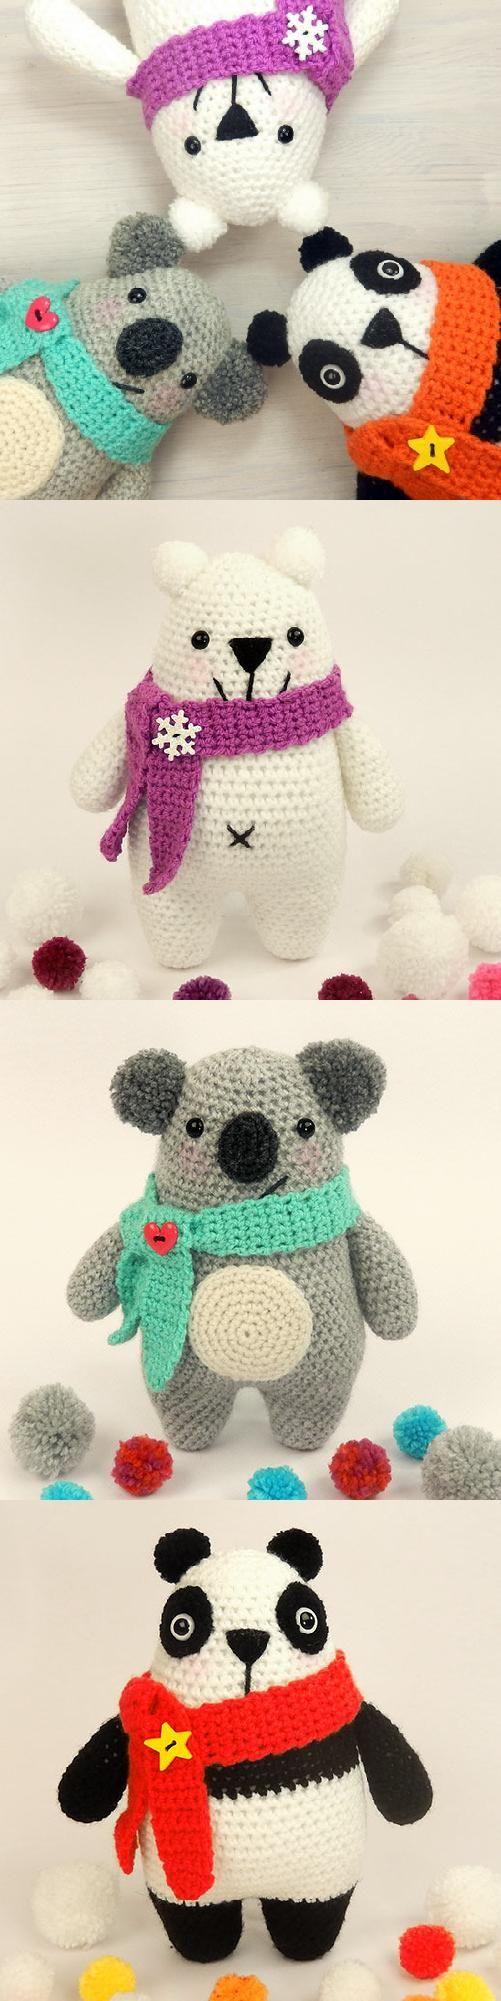 Ning Ning, Norris and Nook amigurumi pattern by Janine Holmes at Moji-Moji…